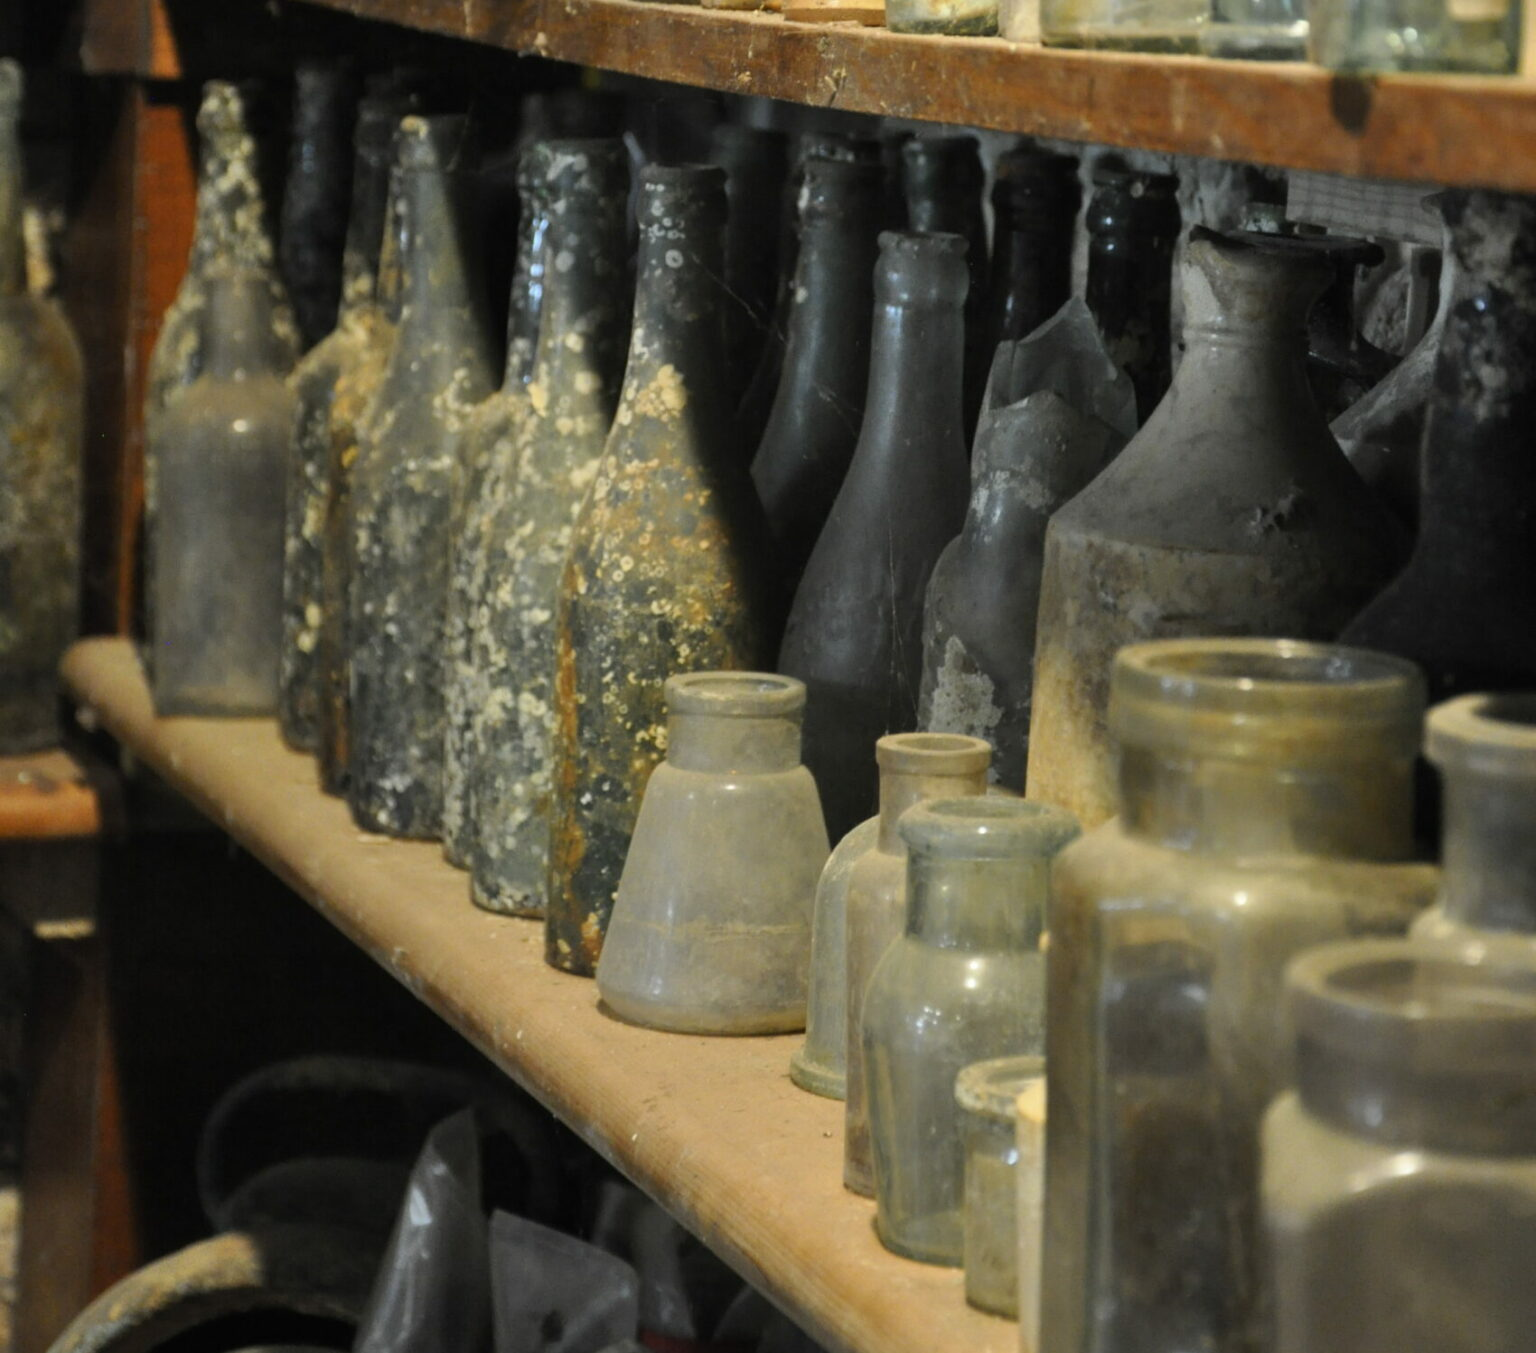 maritime museum shipwreck bottles